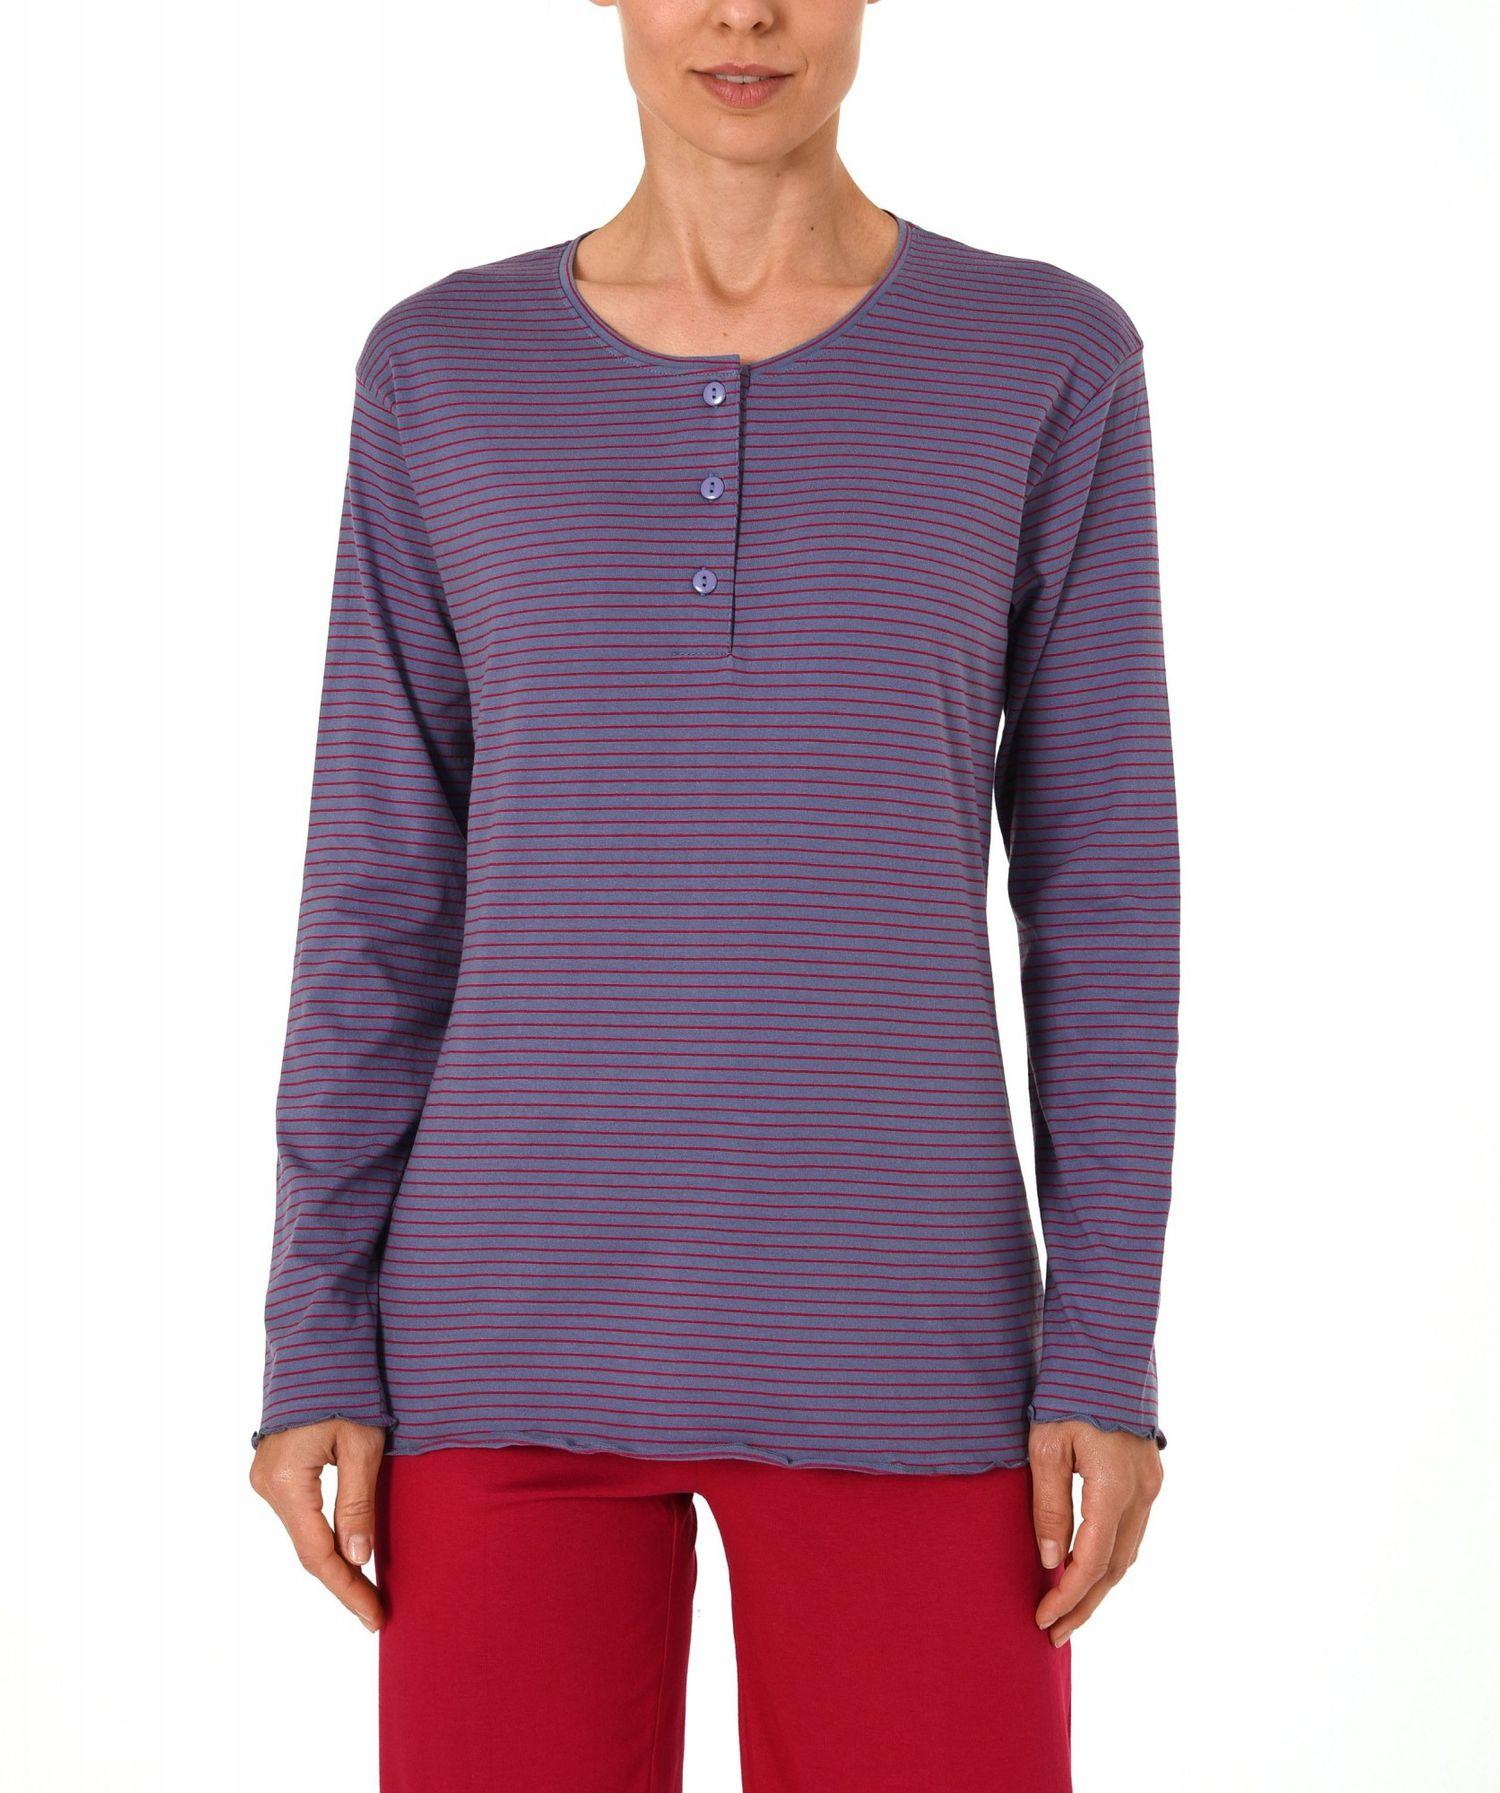 Damen Shirt - Oberteil langarm Mix & Match in toller Streifenoptik – 271 219 90 105 – Bild 4